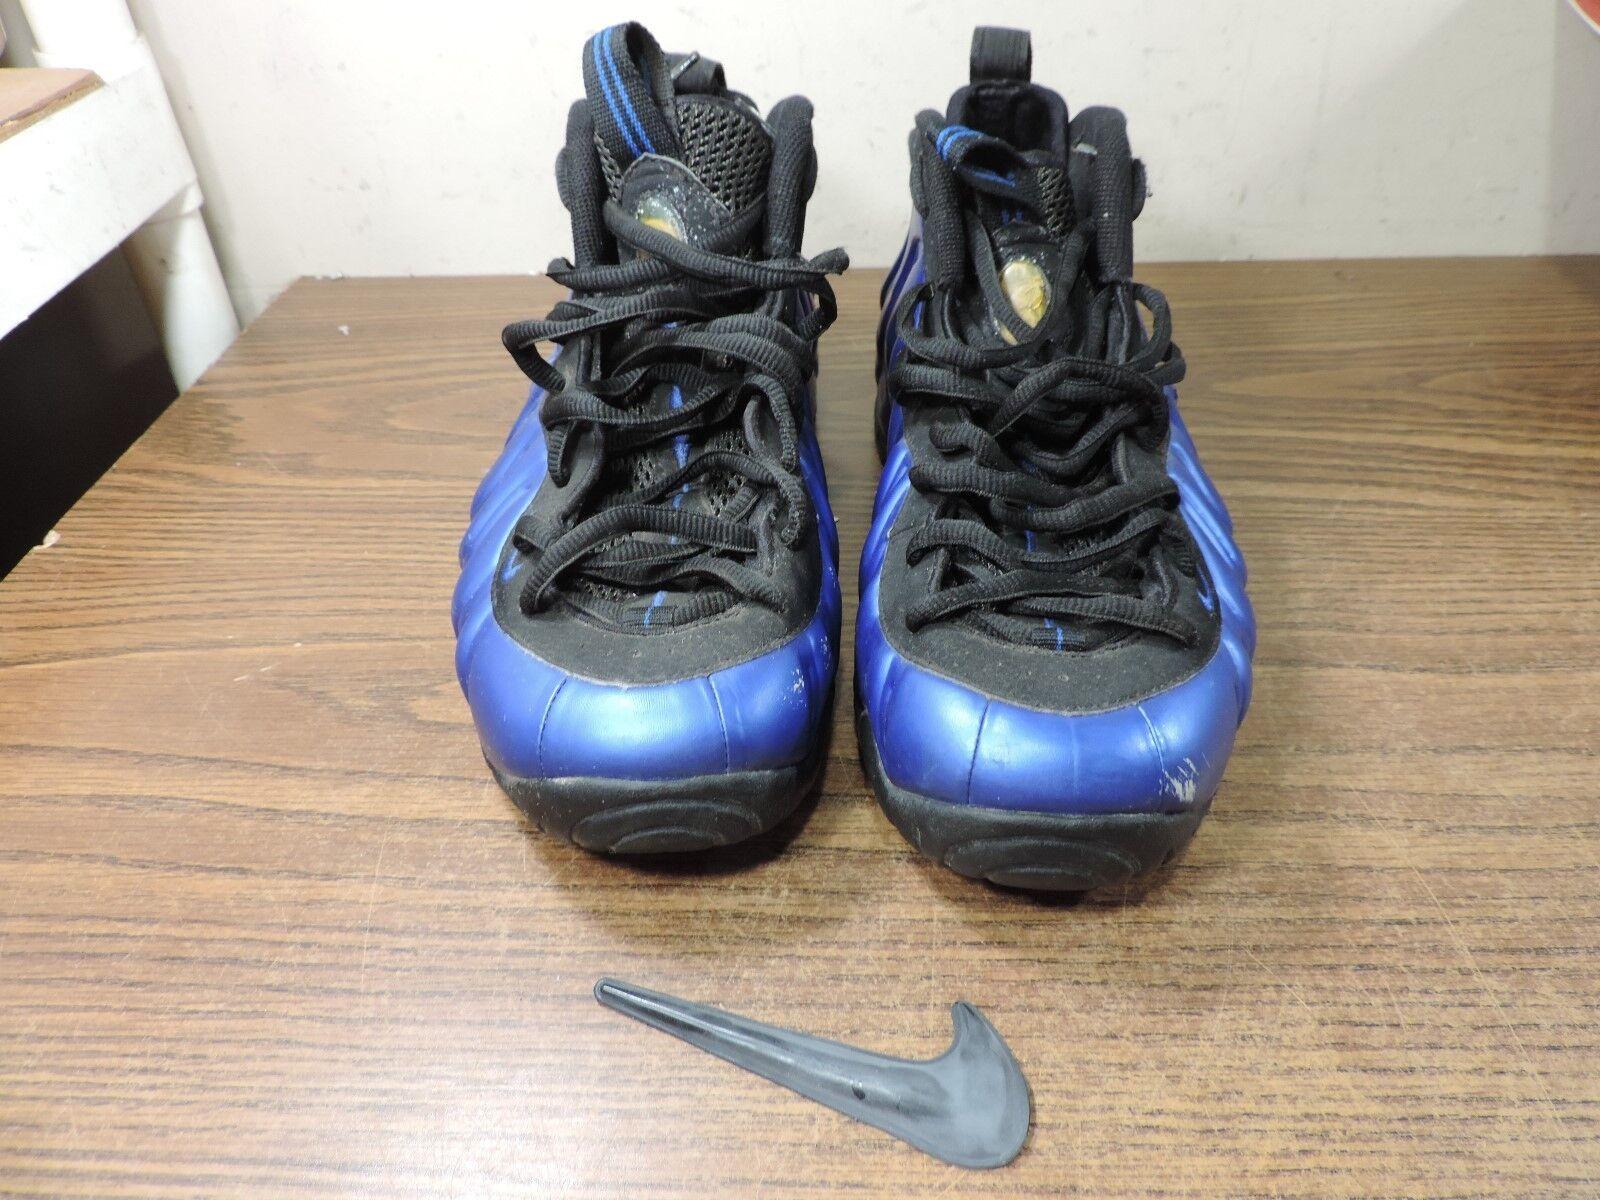 Nike® Foamposite Pro B Varsity Royal Black 624041-401 Size 11